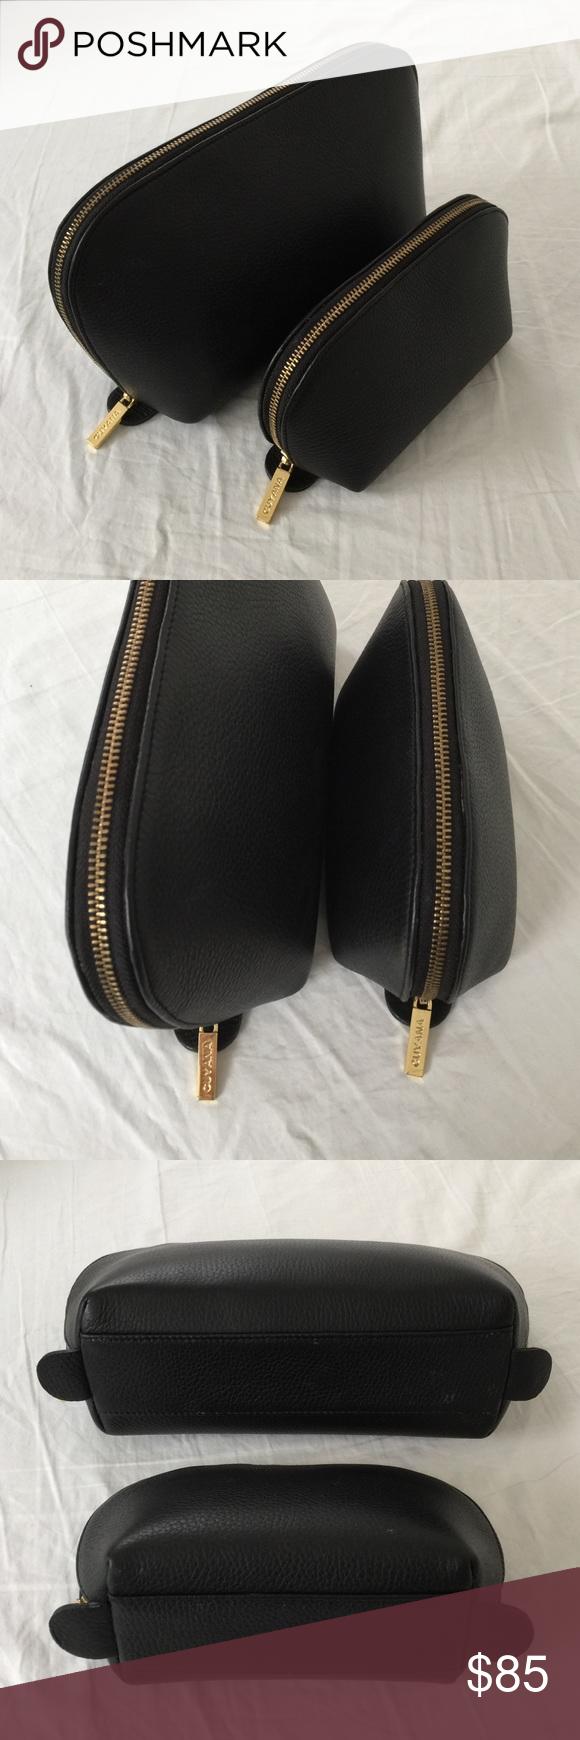 Cuyana Travel Case Set Black Pebbled Leather Black